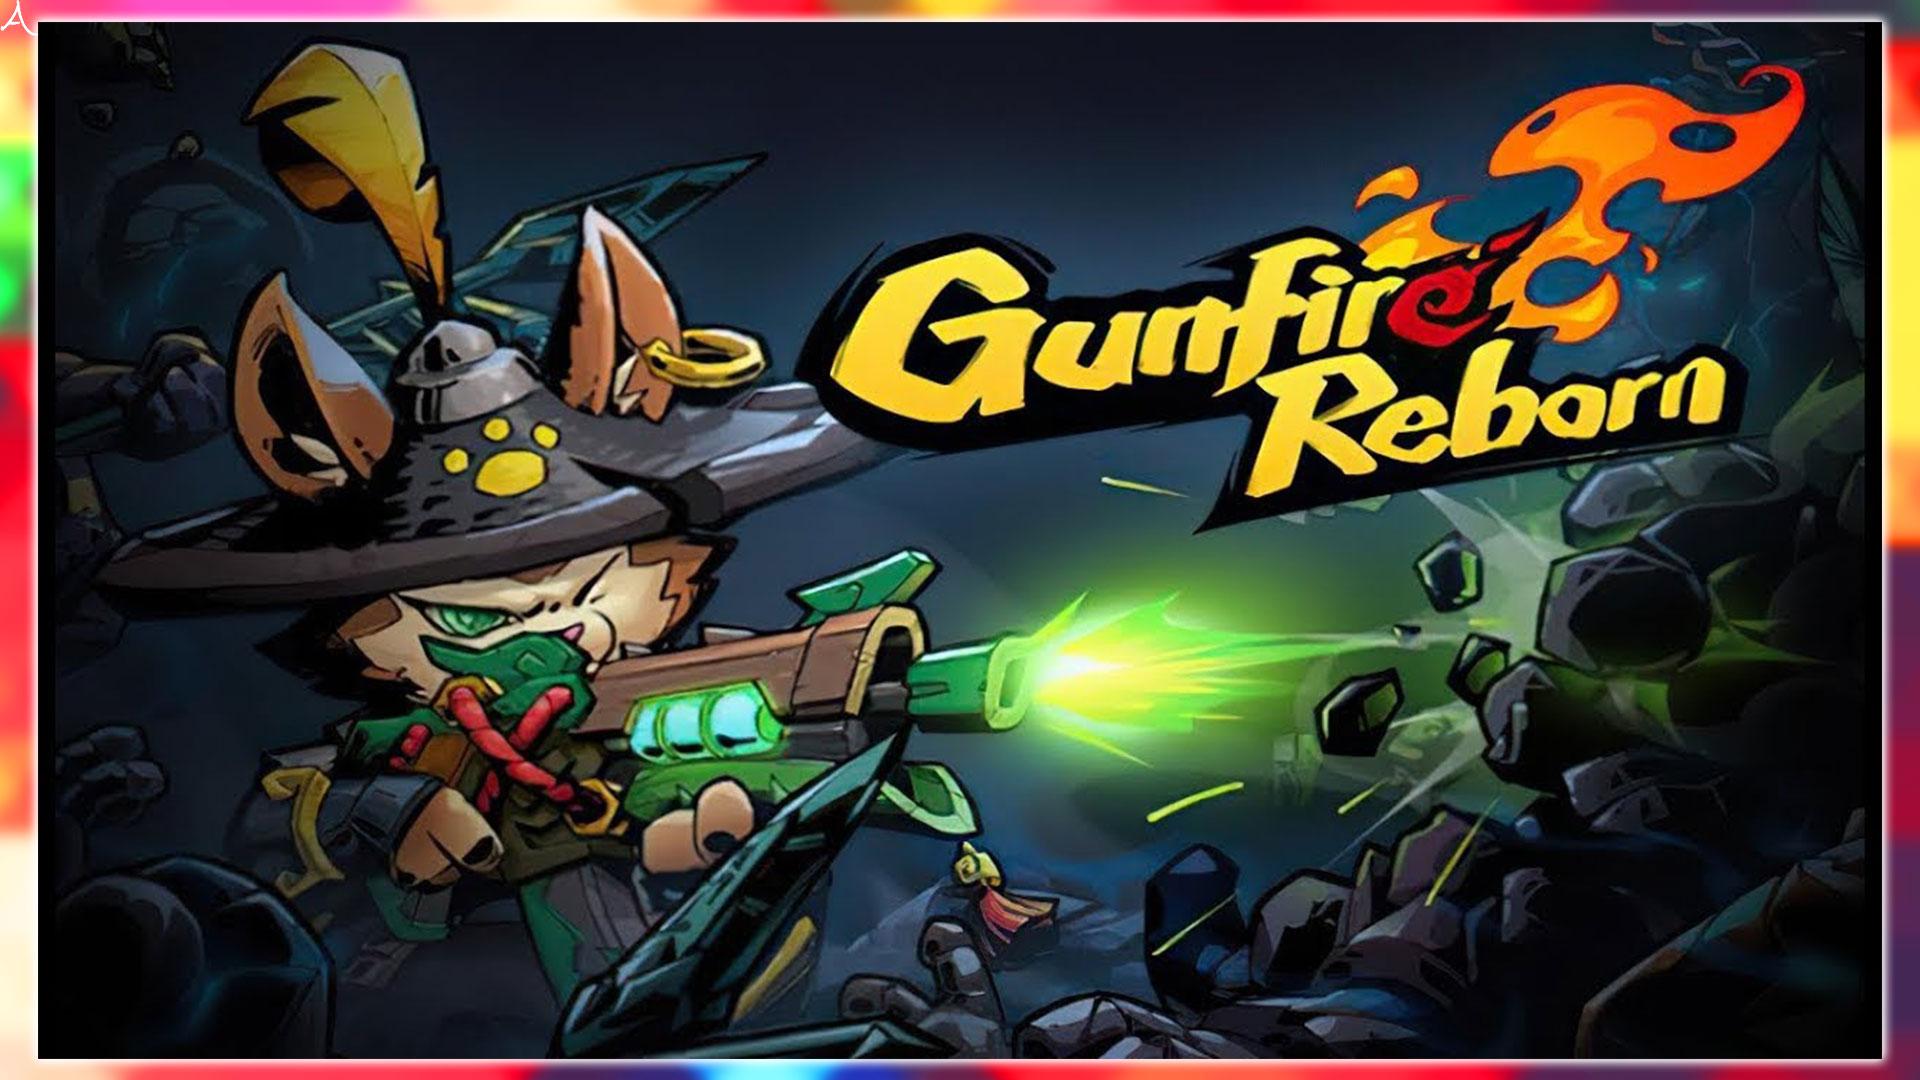 PC版「Gunfire Reborn」に必要な最低/推奨スペックを確認:快適プレイに必要な値段はどれくらい?